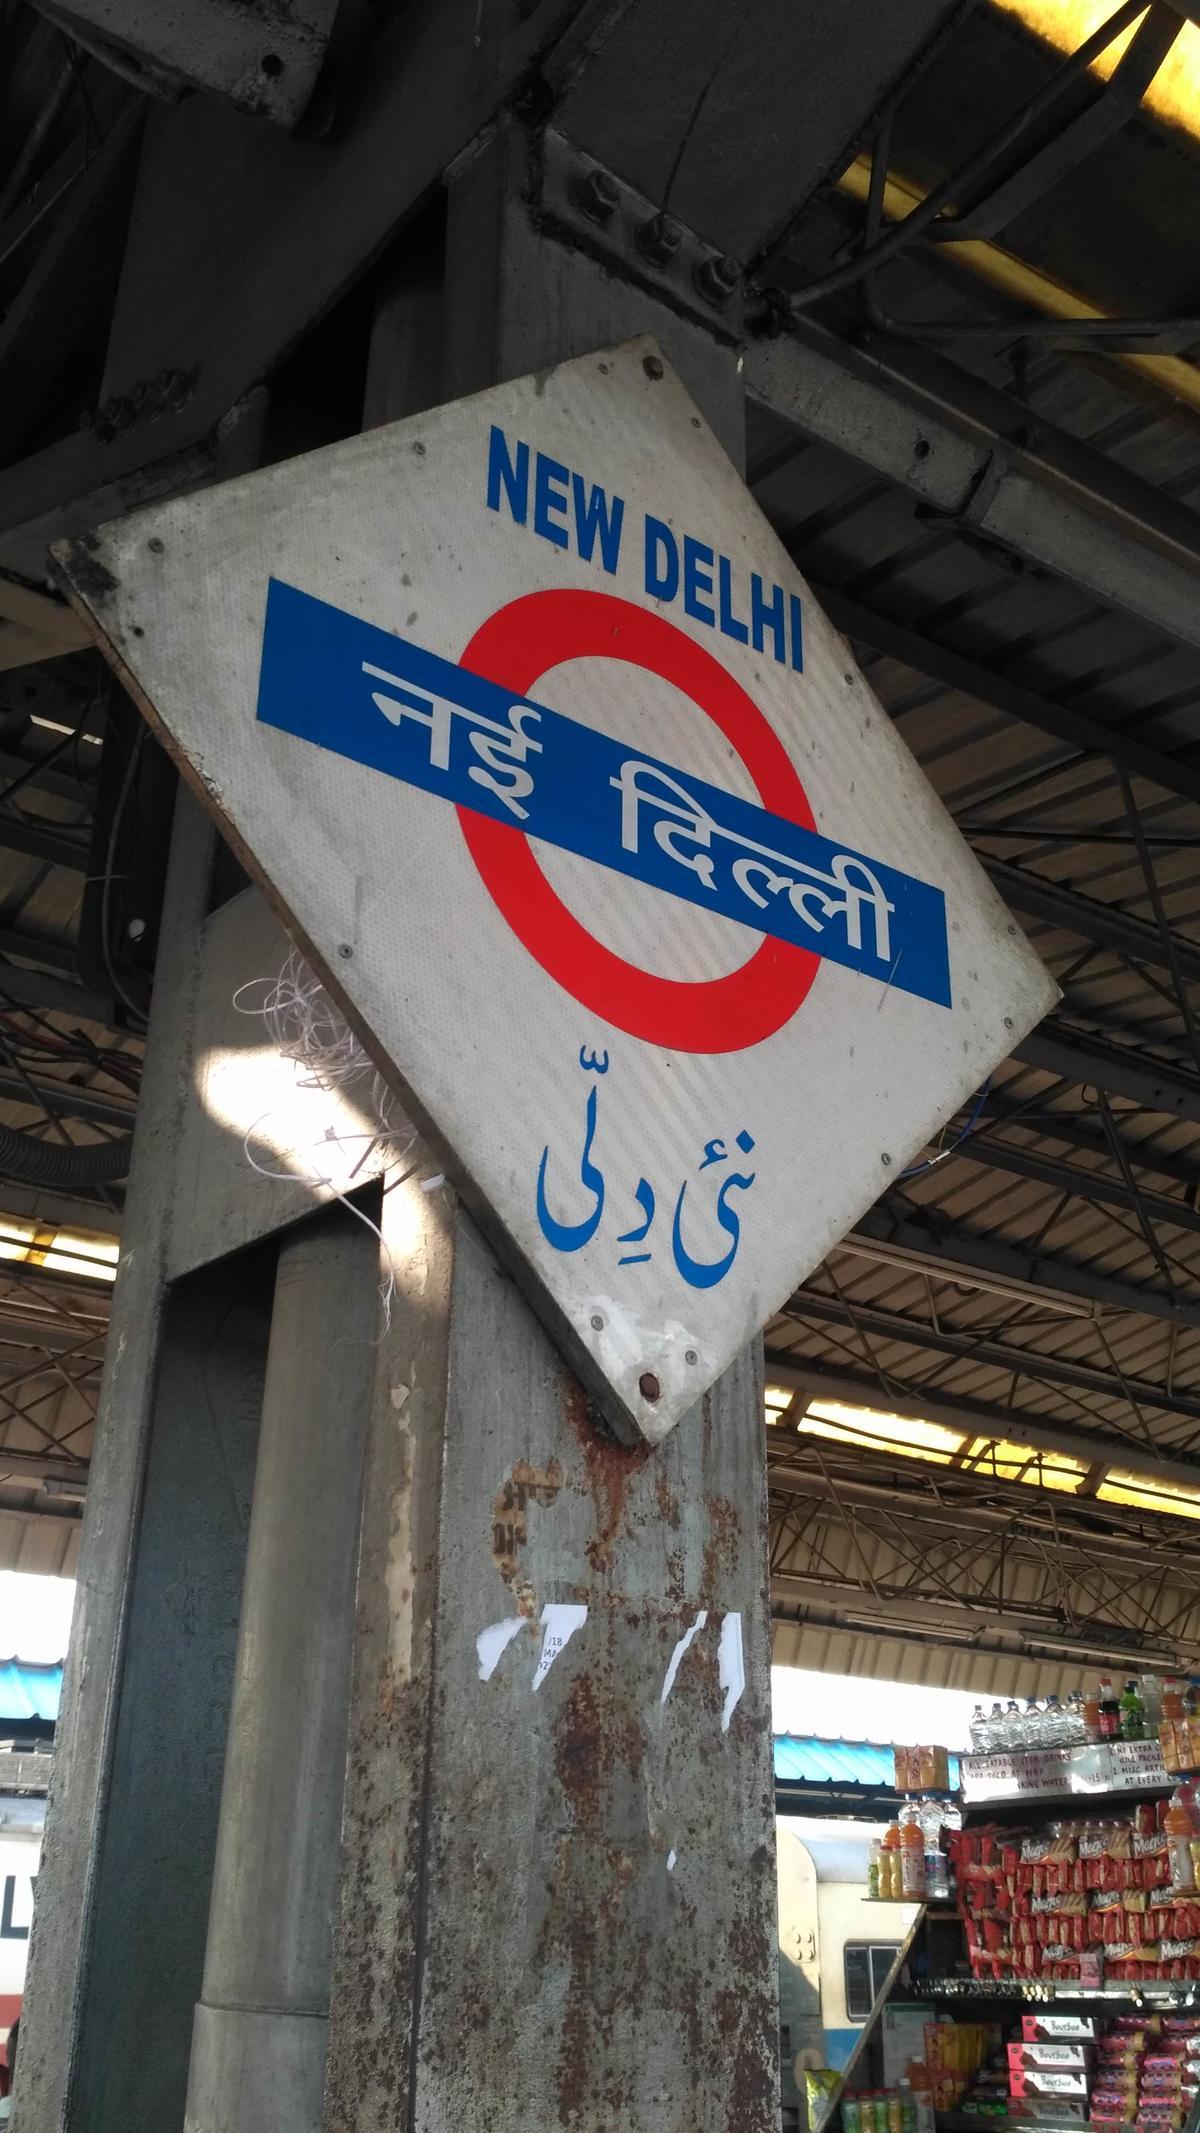 New Delhi to Lucknow Junction NER: 54 Trains, Shortest